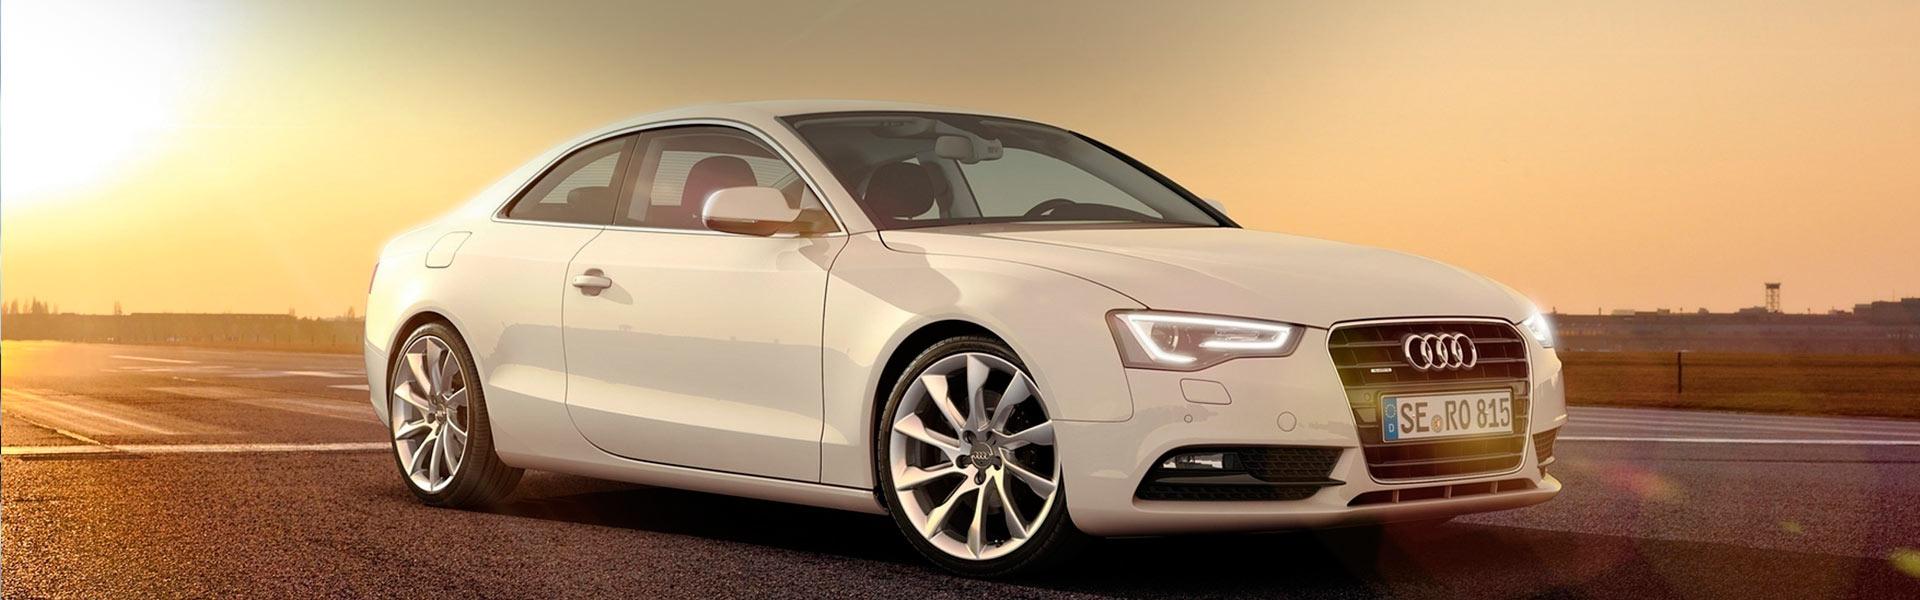 Ступица на Audi A5